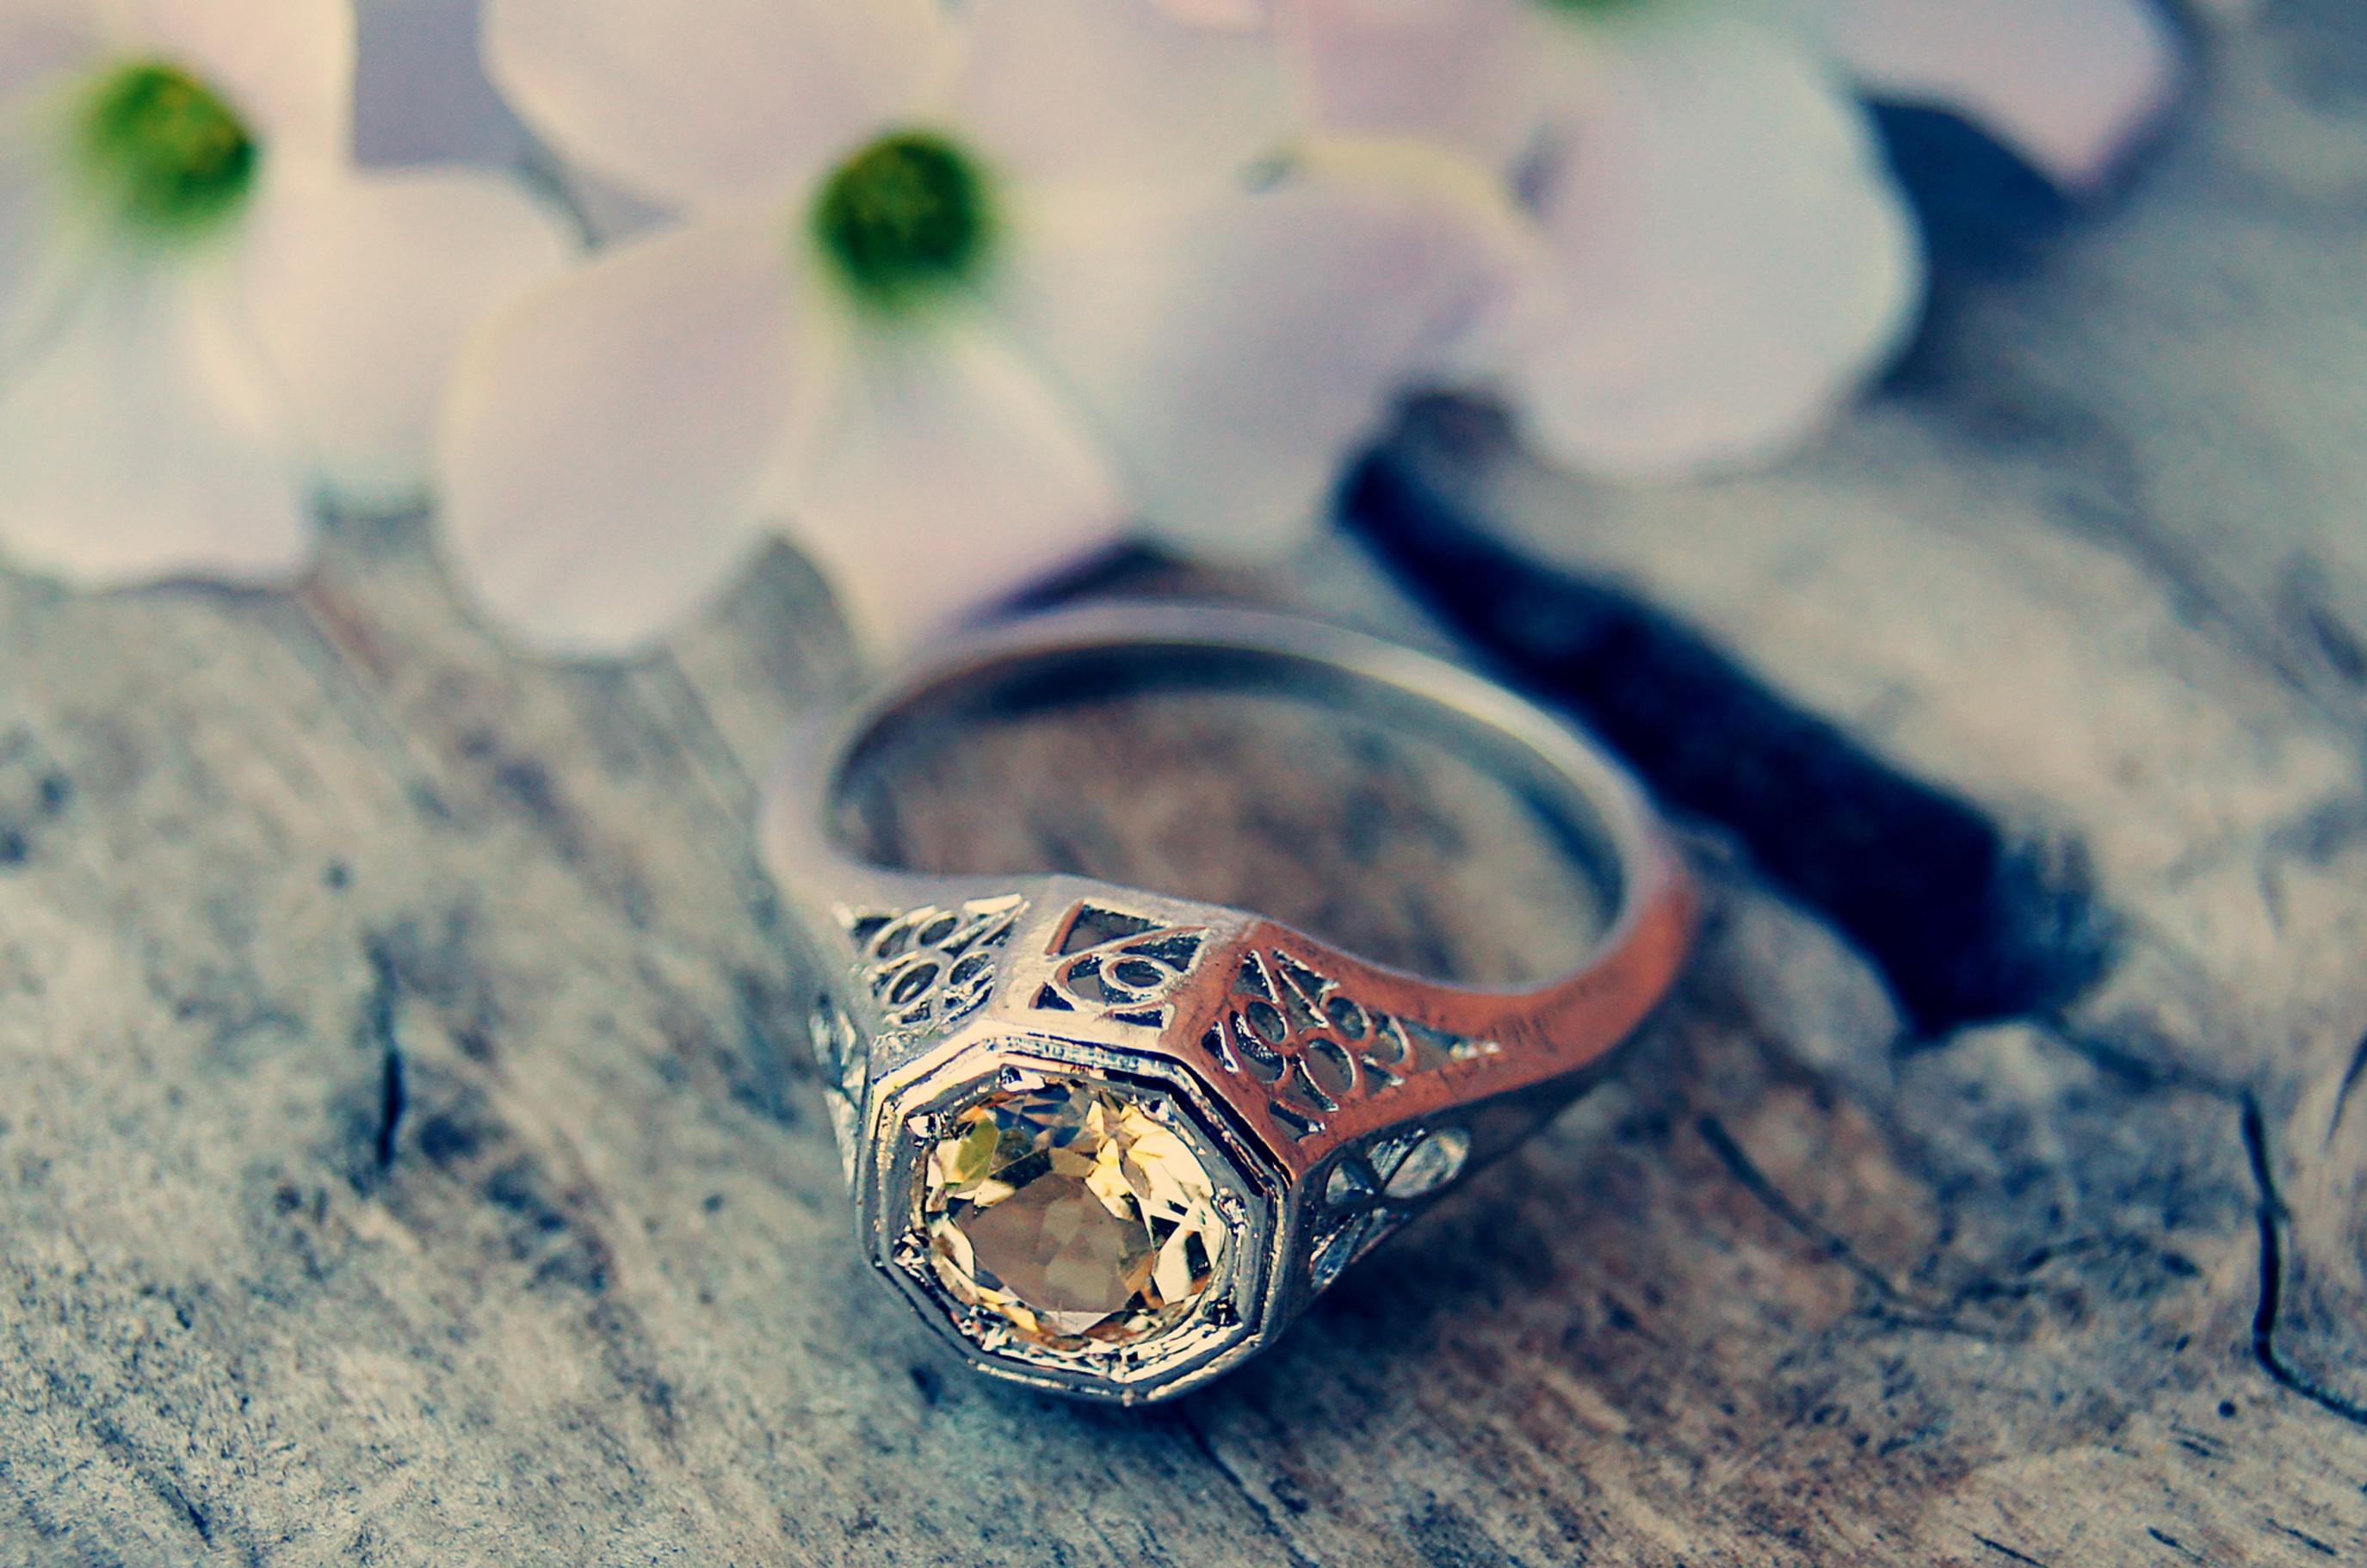 Jewellery Design and Repairs